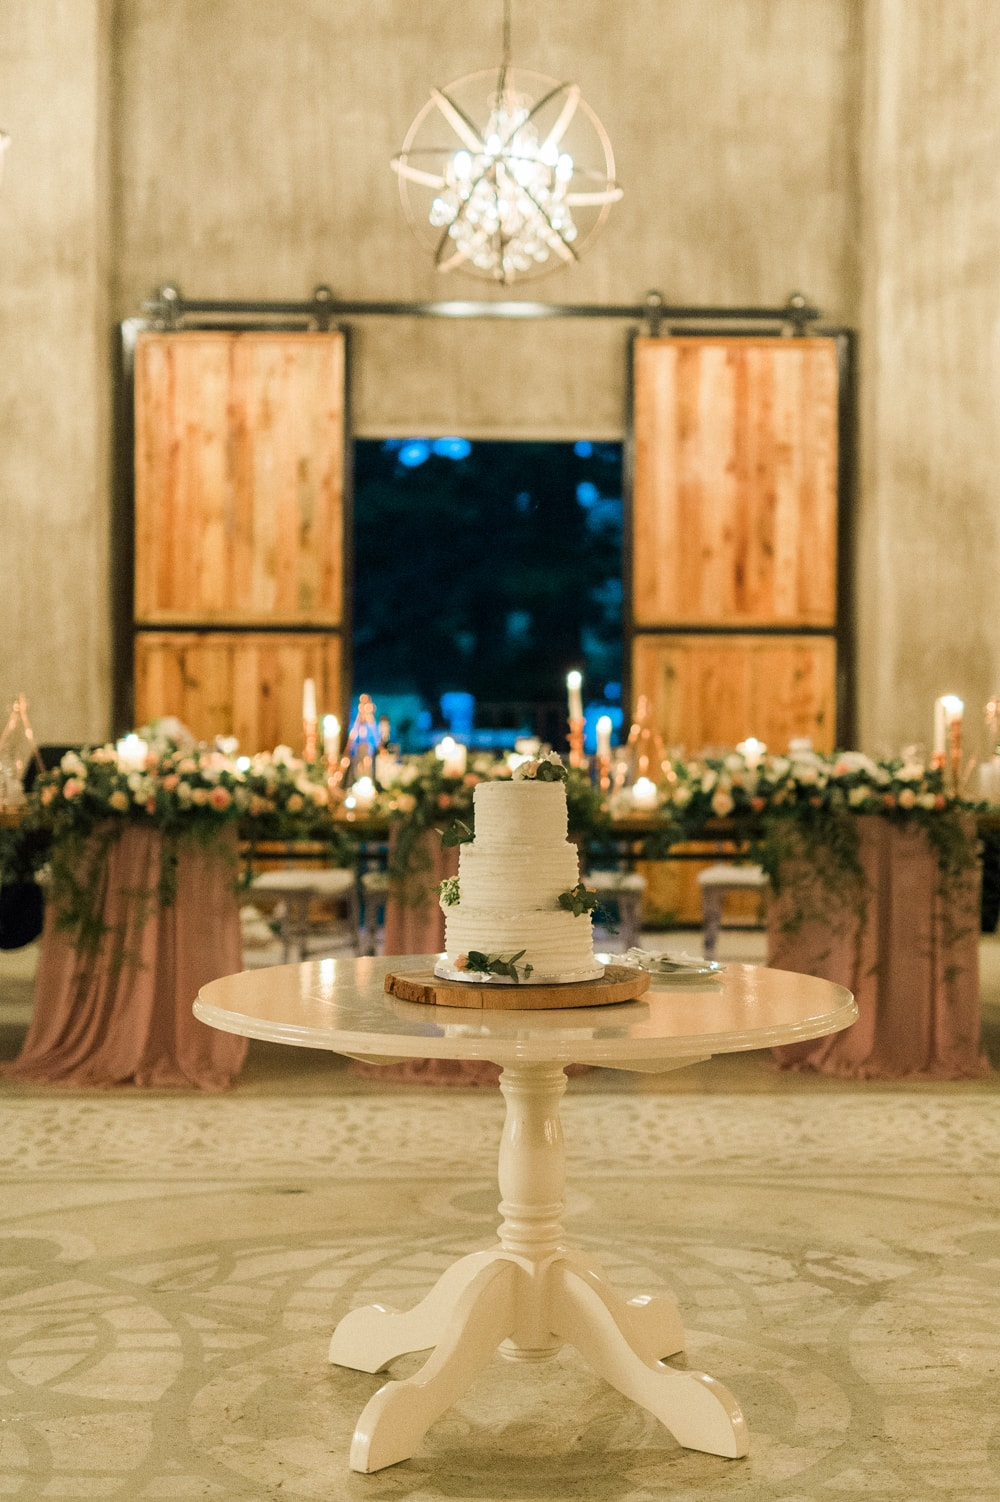 Wedding Cake Display | Image: Bright Girl Photography